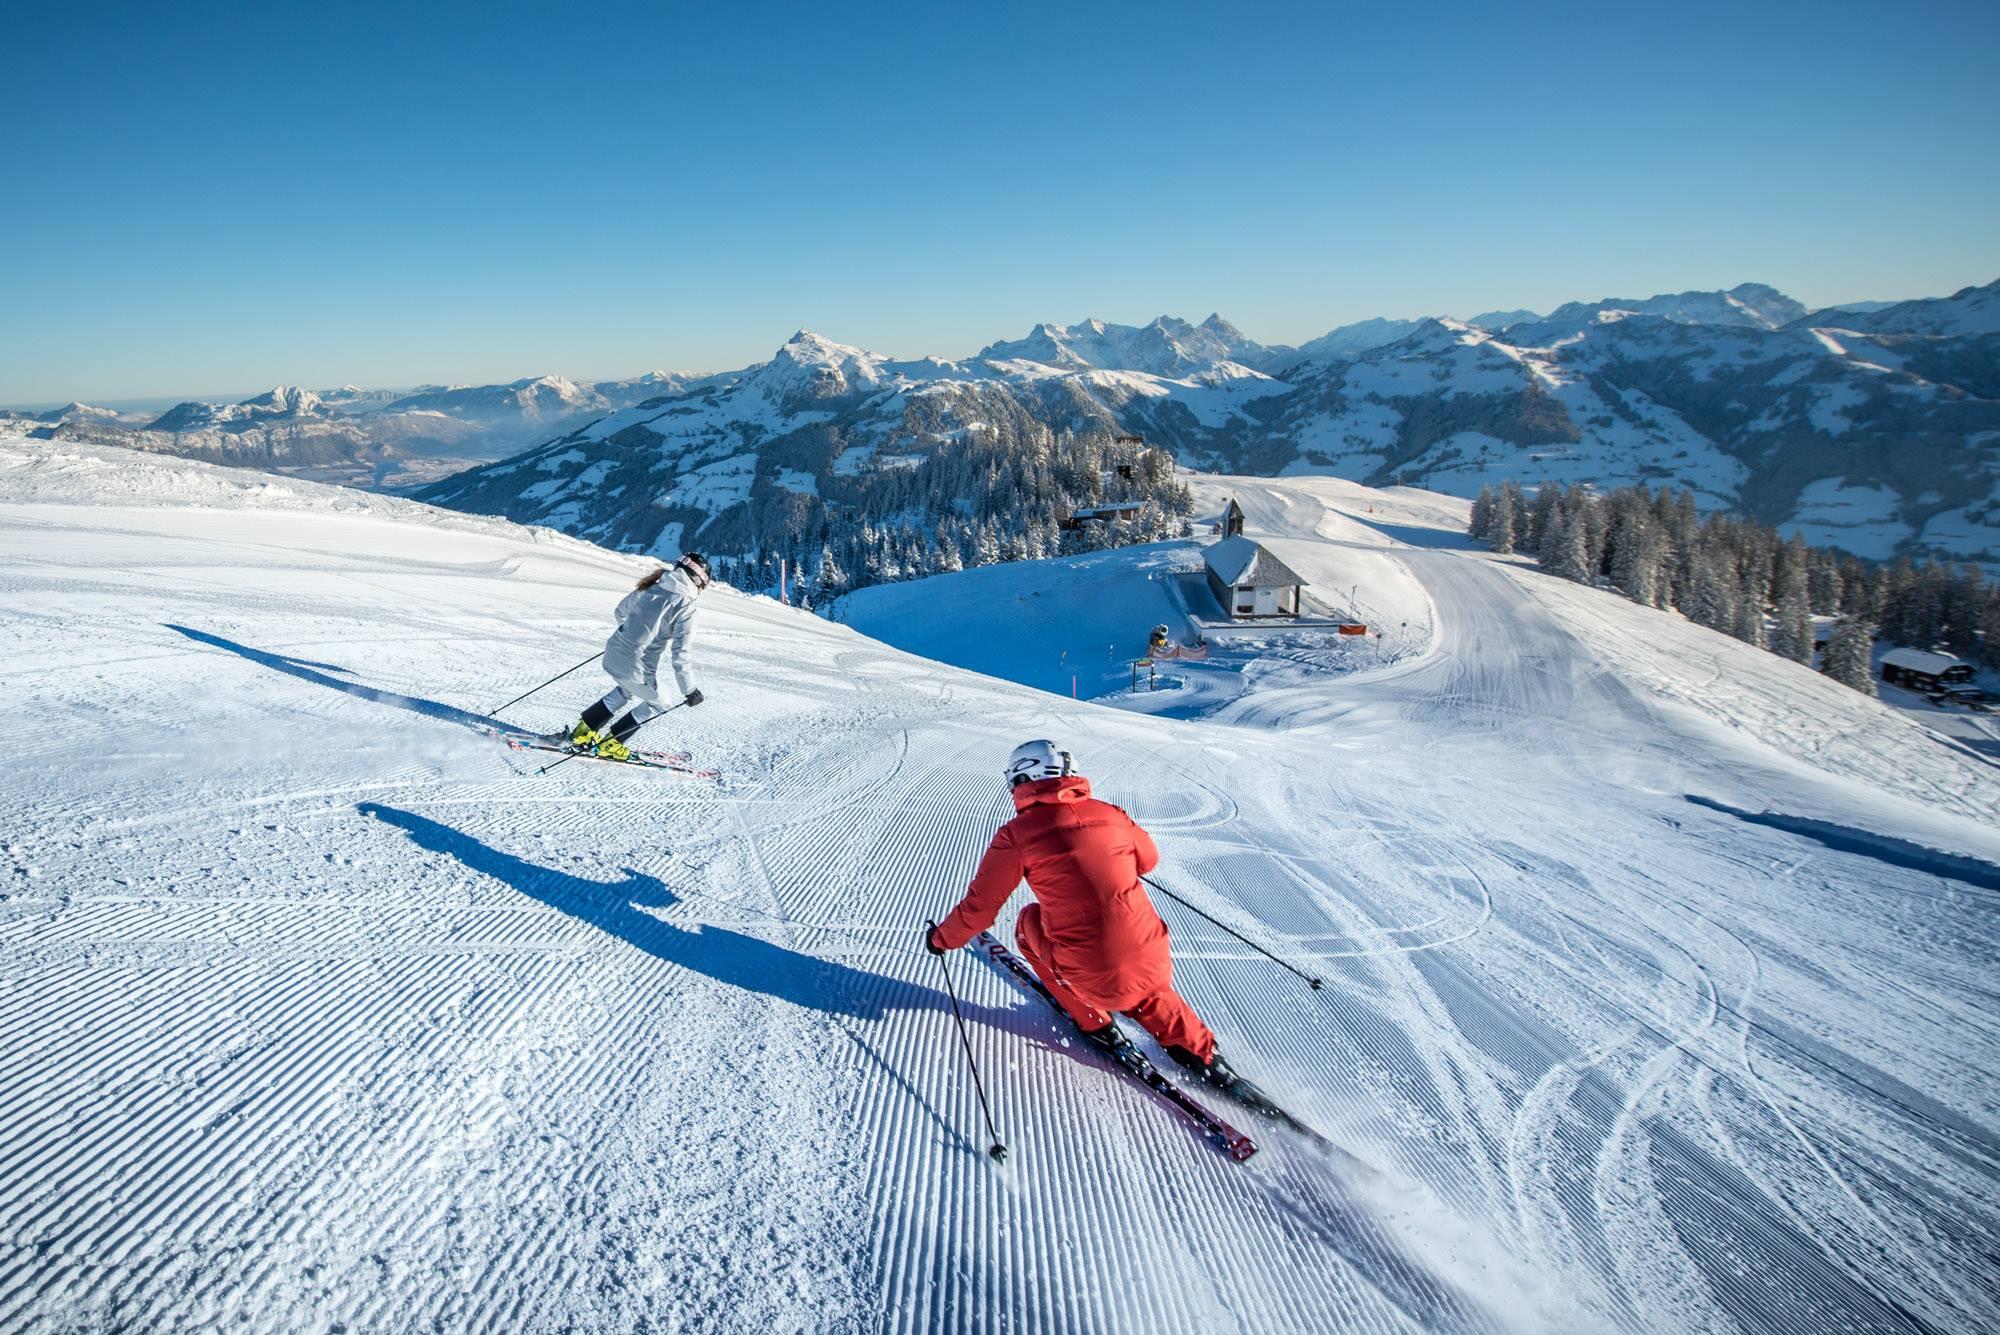 Kitzbuhel Snow Report And Forecast 9 January 2018 Inthesnow